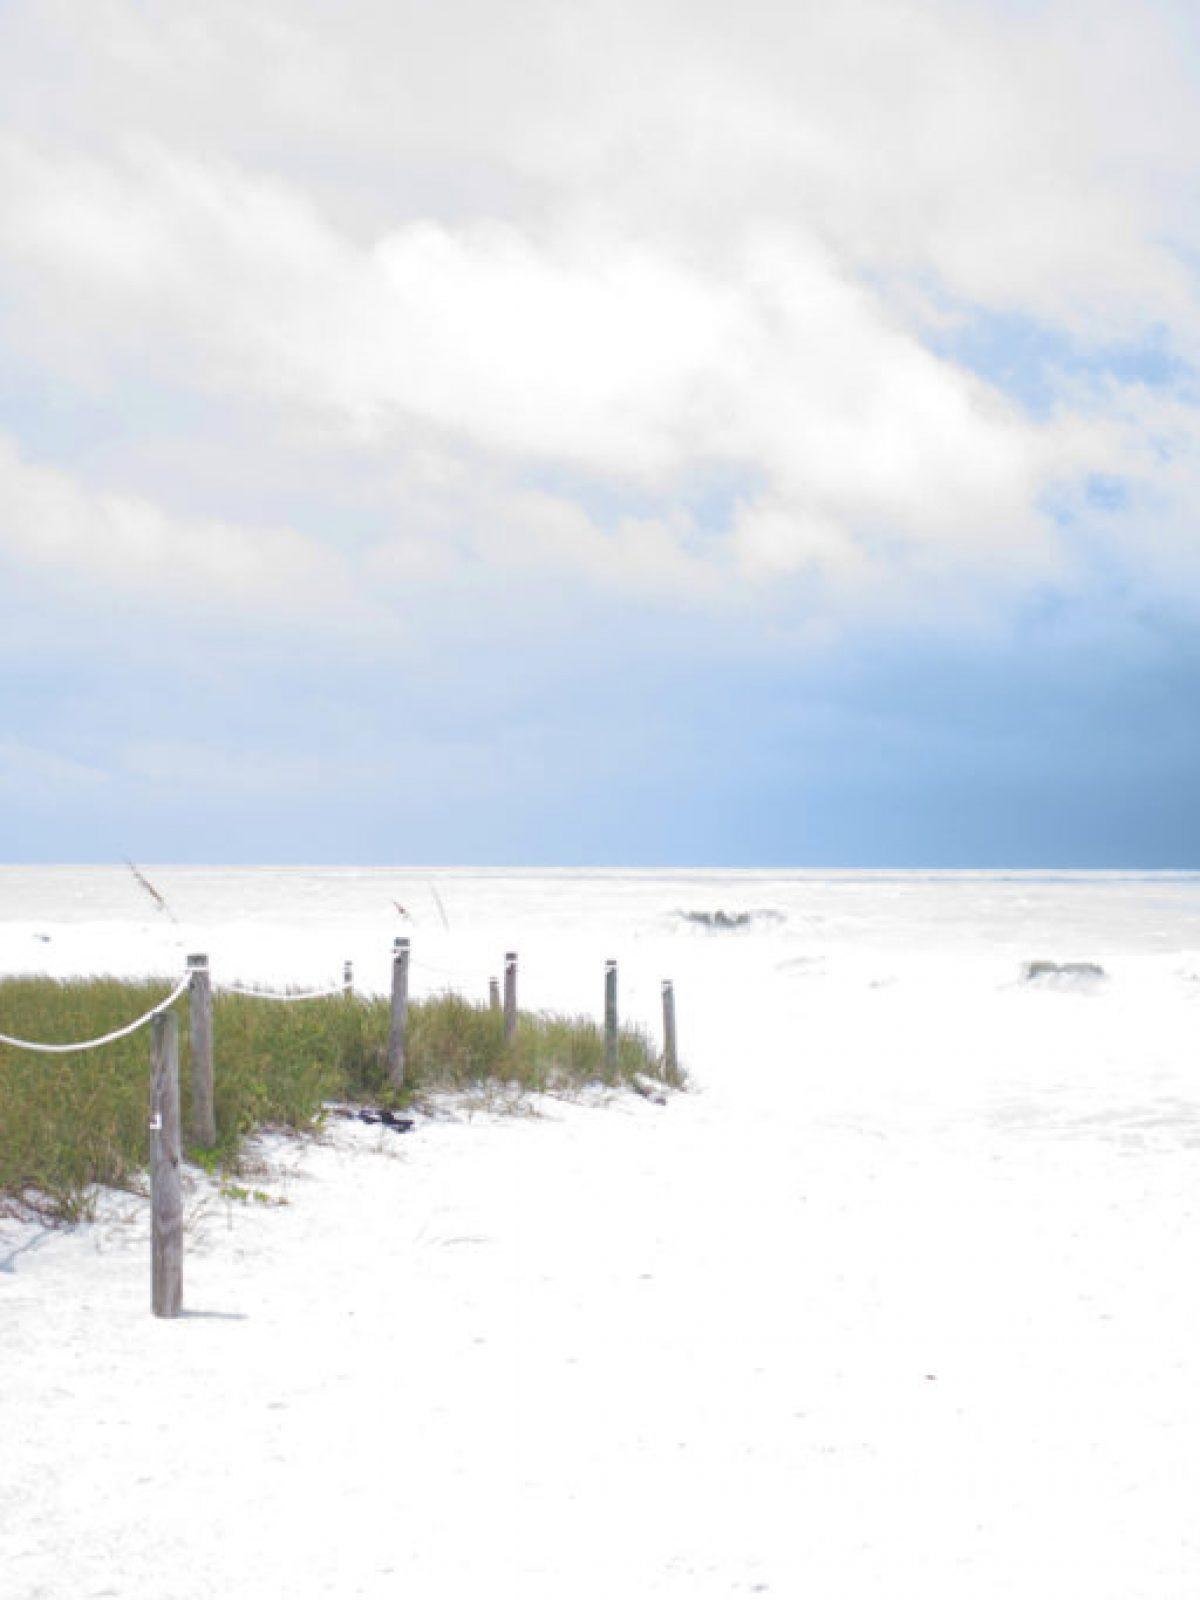 sanibel, captiva, cayo costa, cabbage key, beach vacations, southwest florida, where to go on a beach vacation, island life, best beaches in Florida, south seas island resort